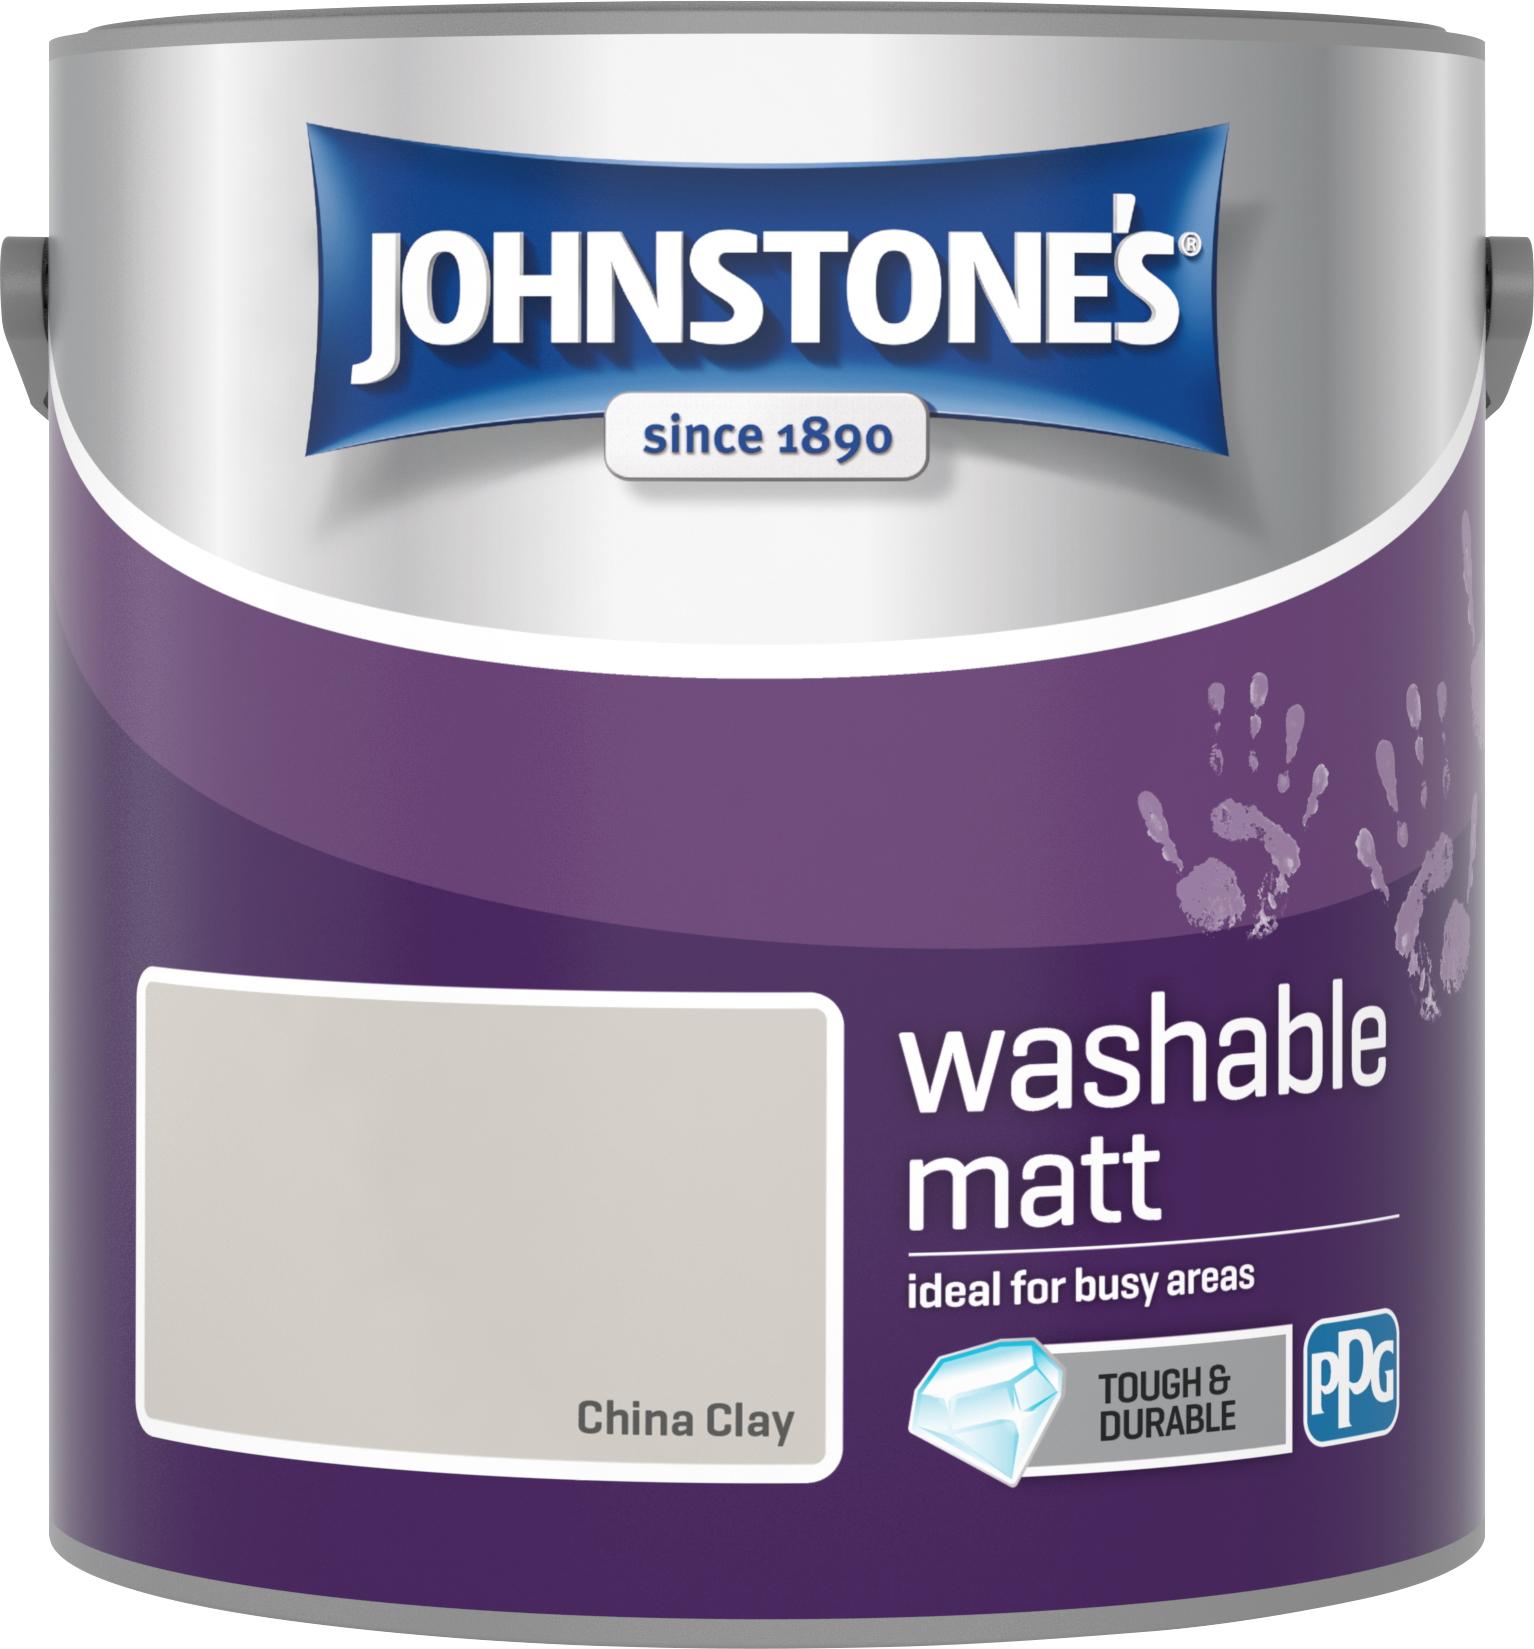 Johnstone's 2.5 Litre Washable Matt Emulsion Paint - China Clay